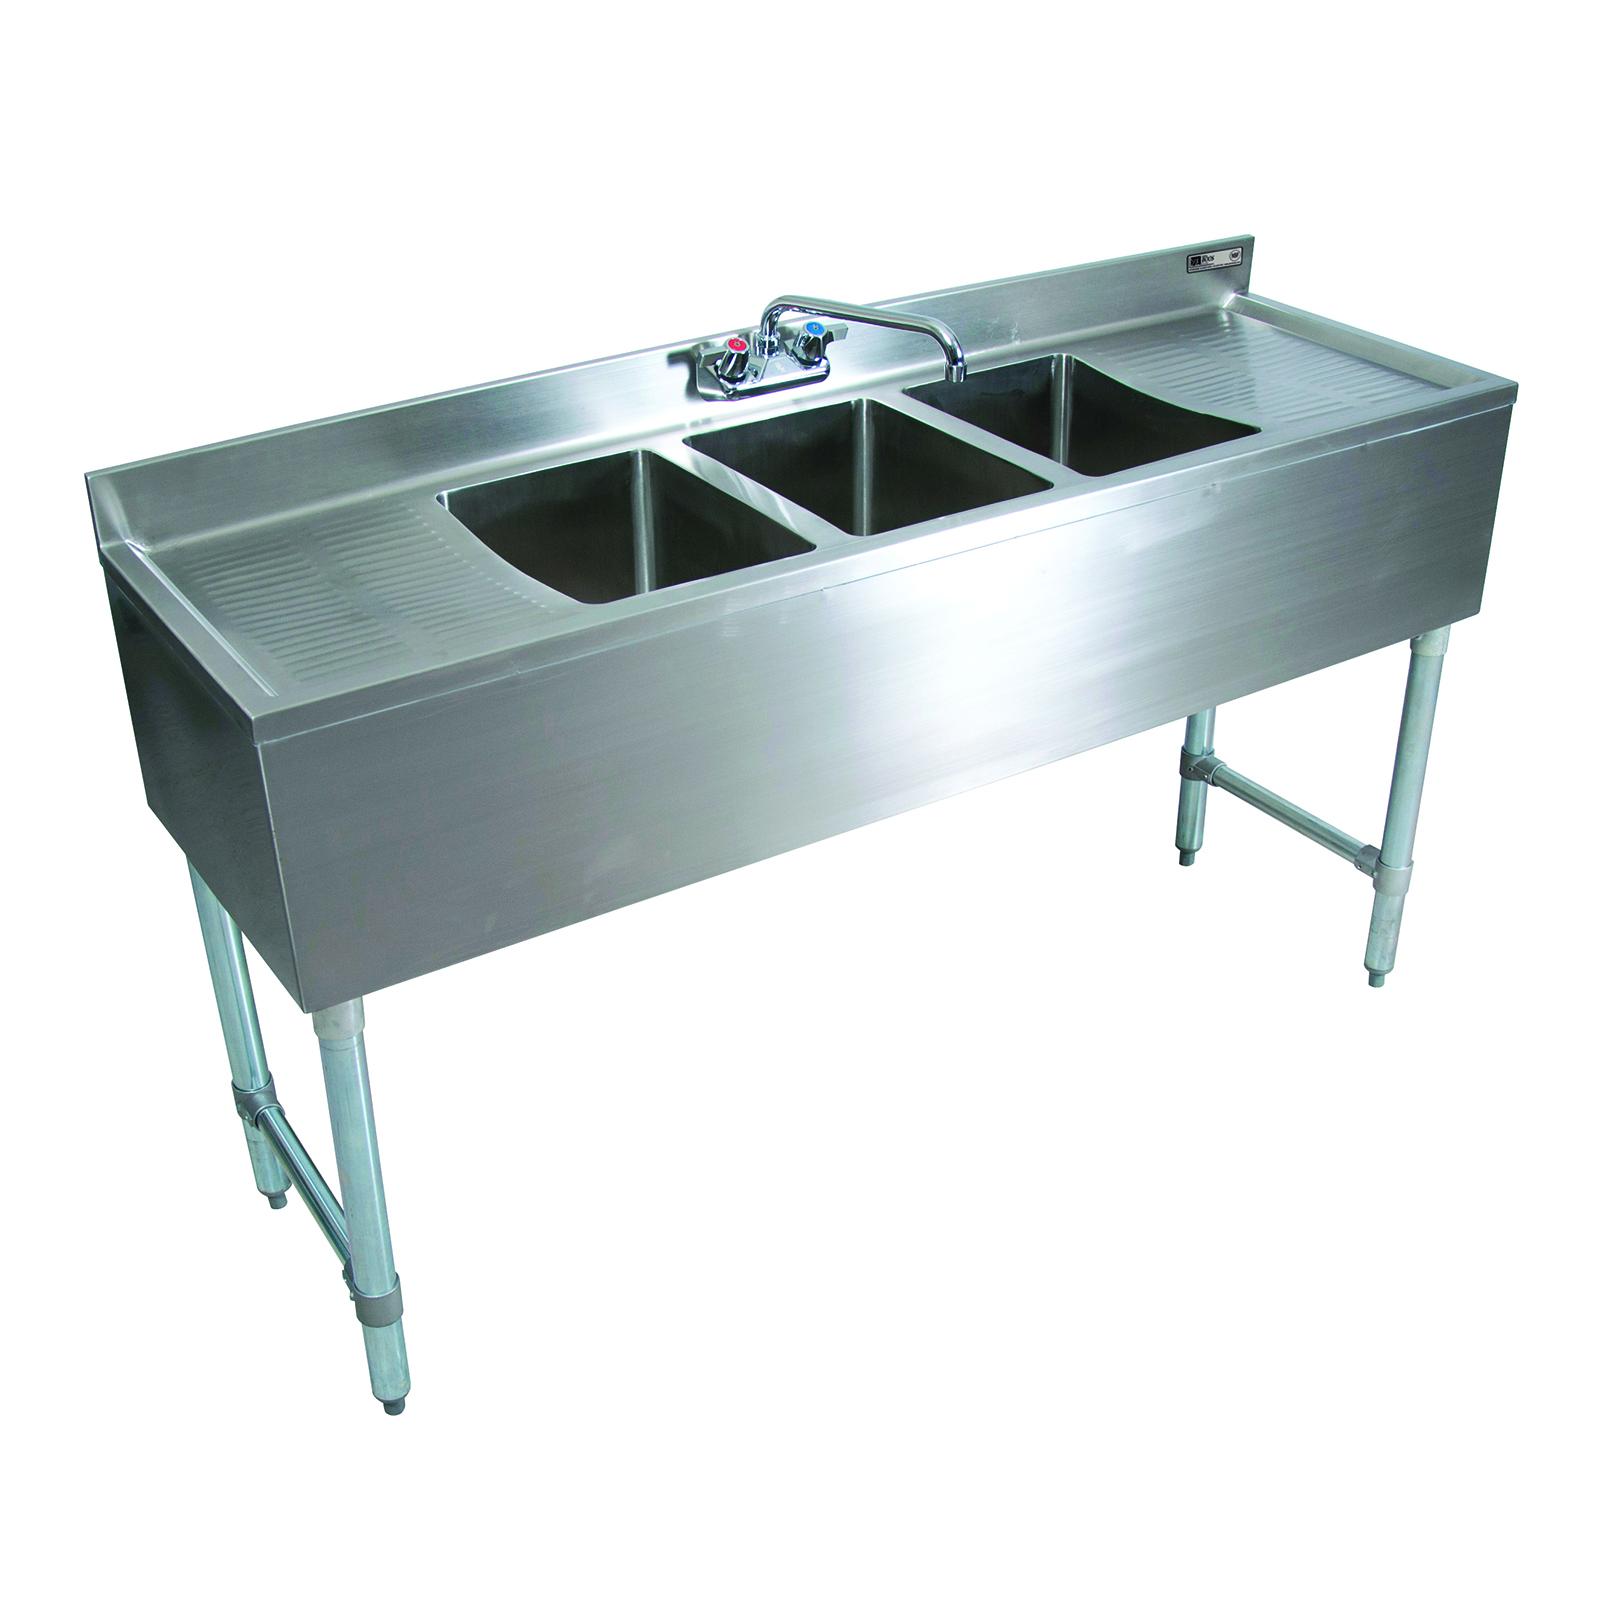 John Boos EUB4S72SL-2D underbar sink units